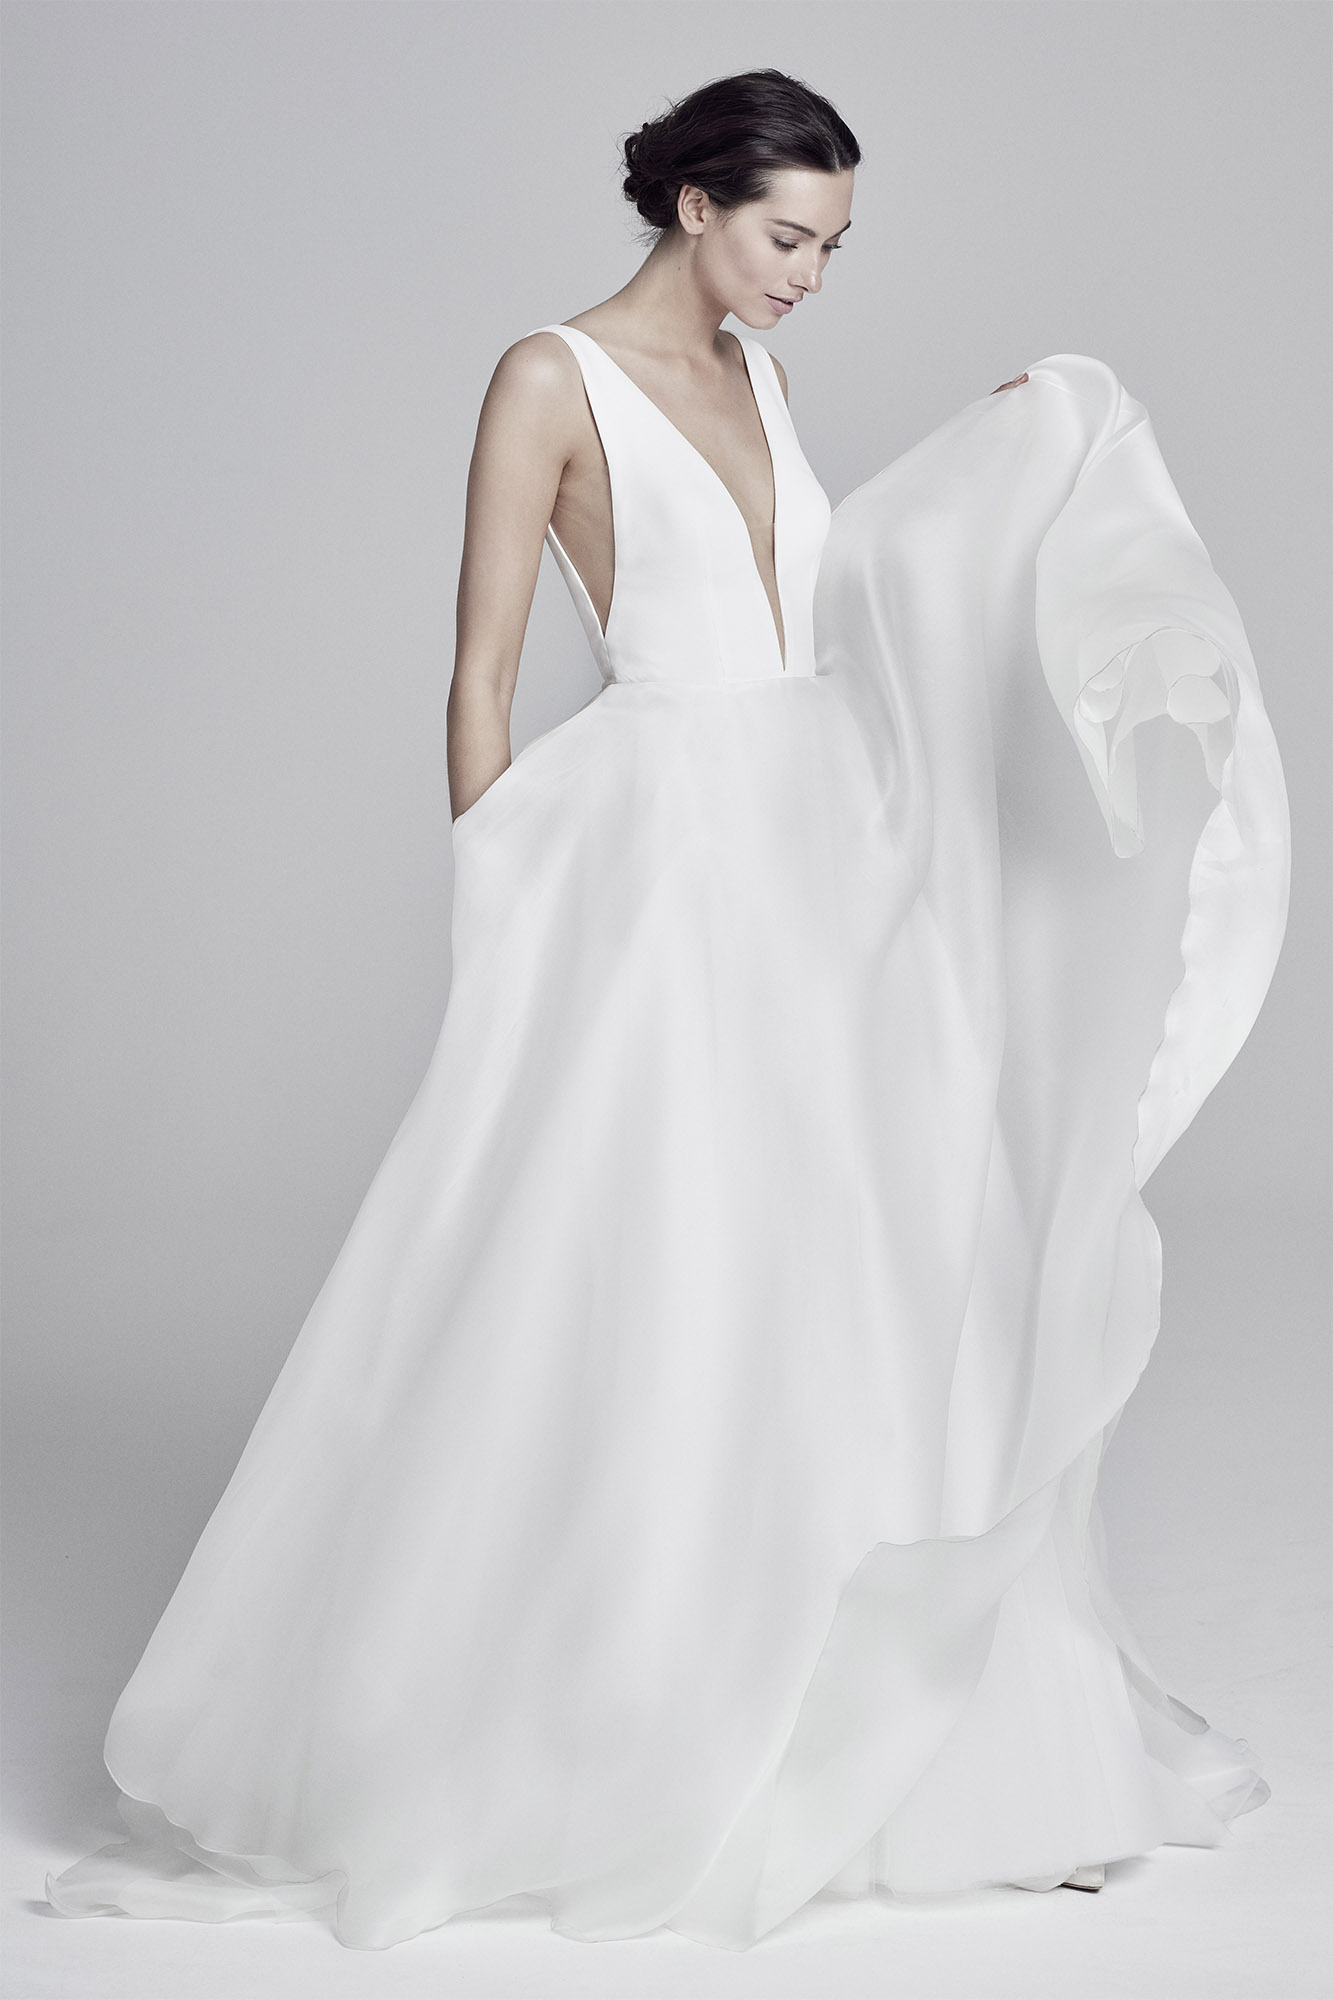 Serrano | Lookbook Collection 2019 | designer wedding dresses by Suzanne Neville